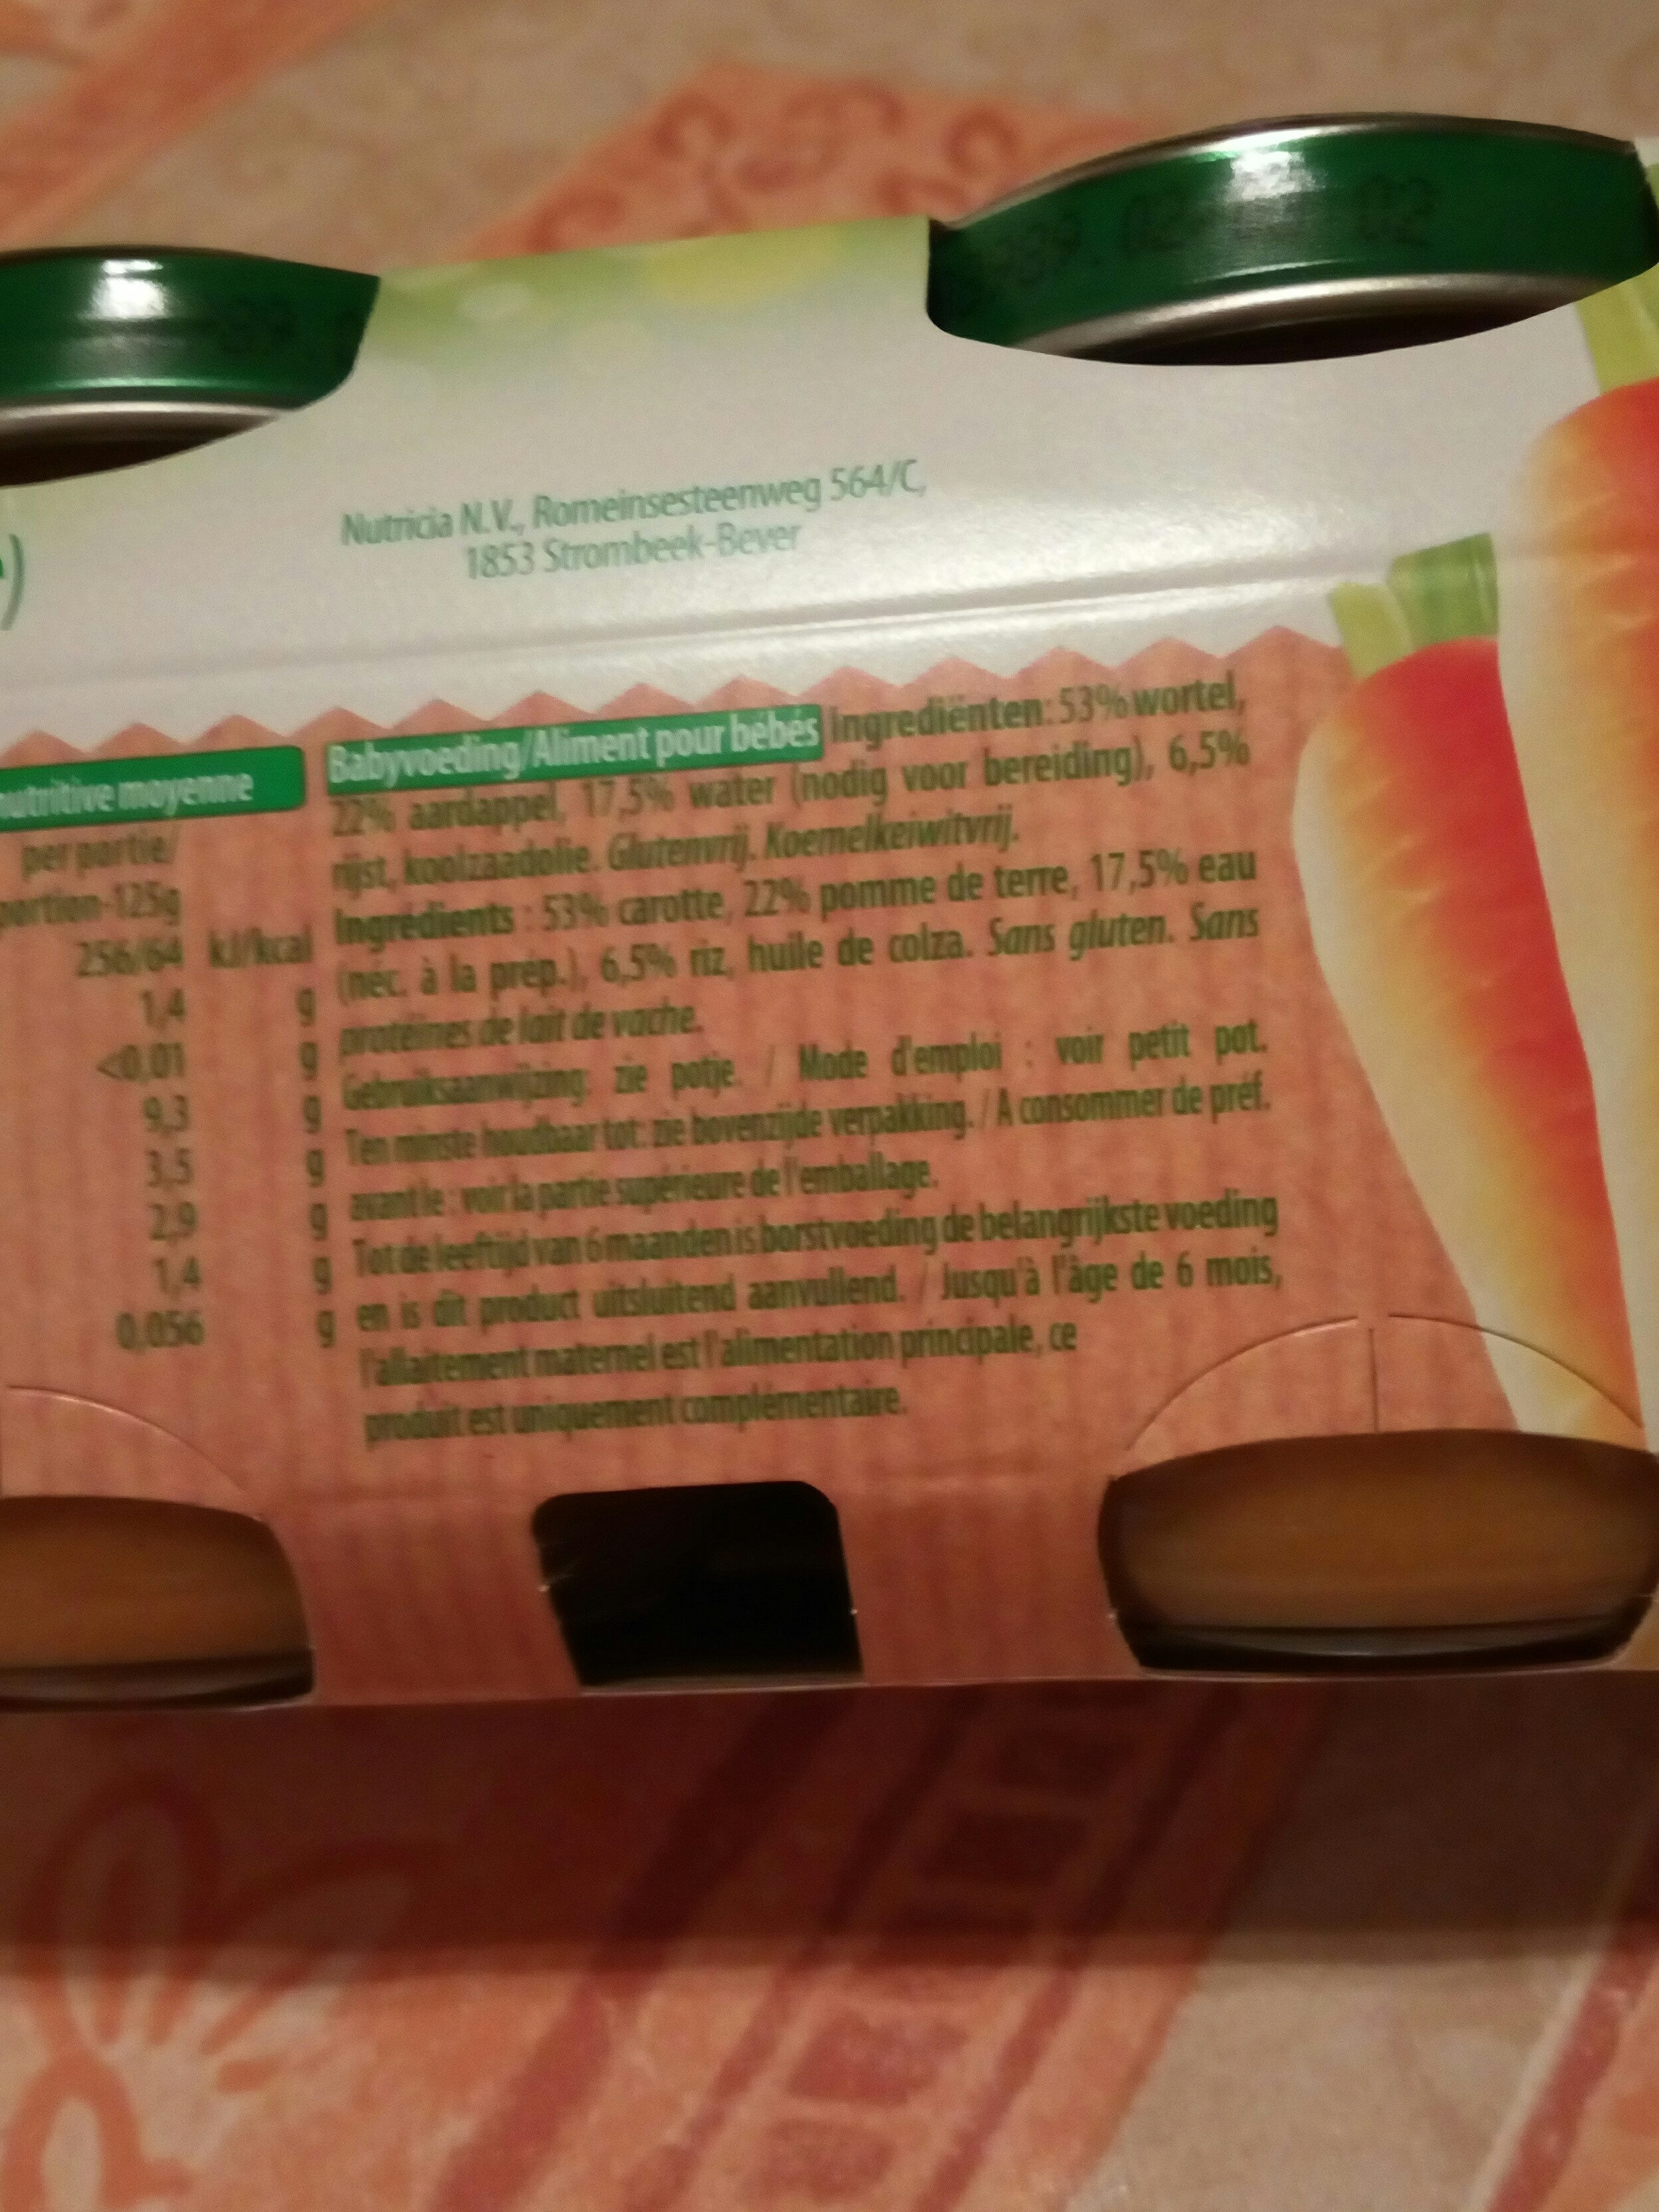 Carotte pomme de terre - Ingrediënten